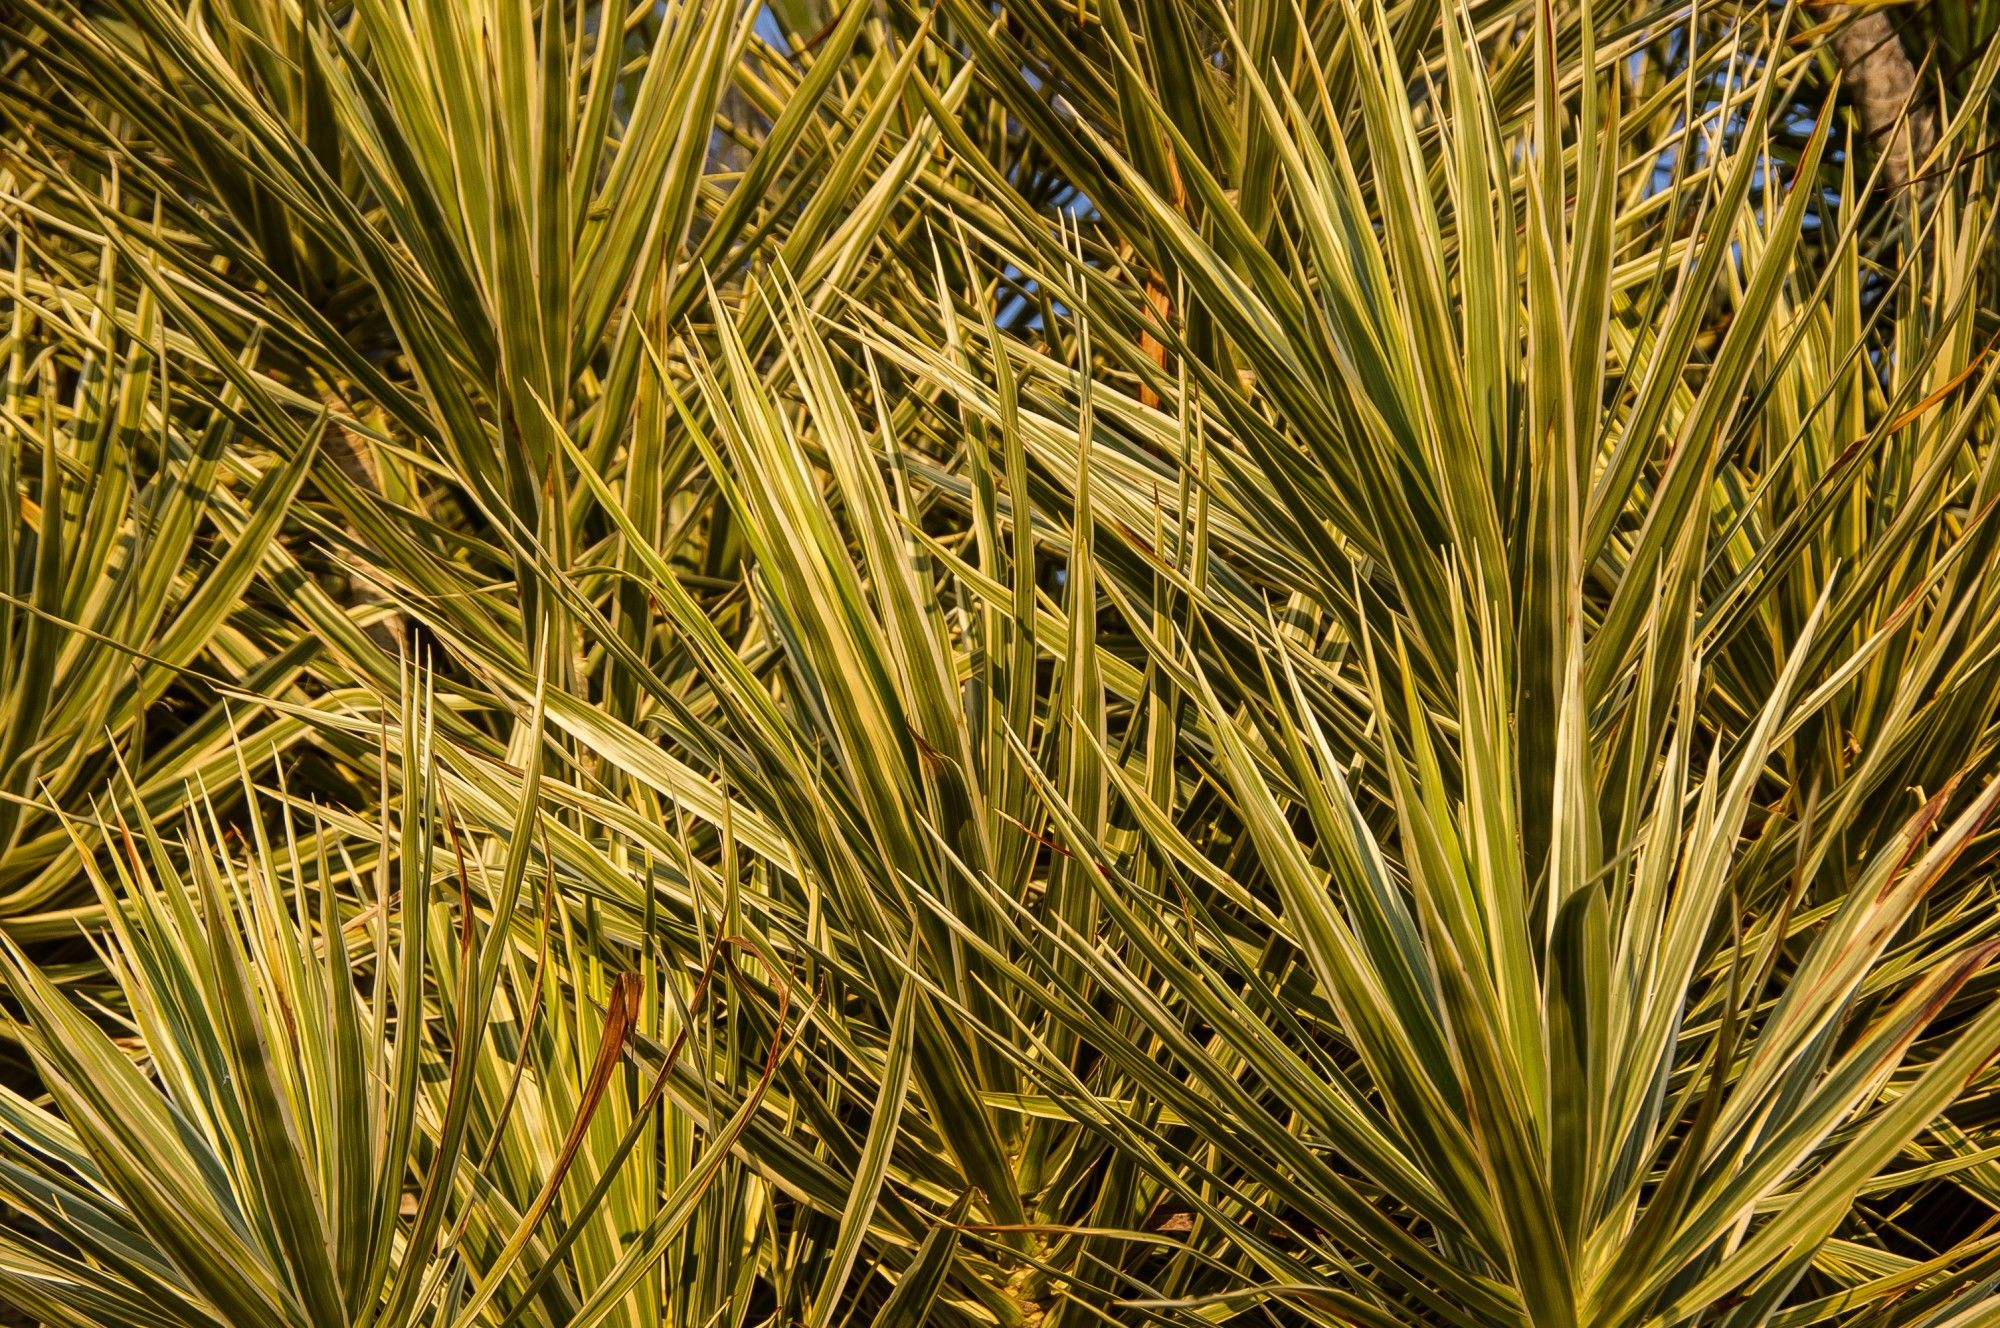 dracaena plant care tips